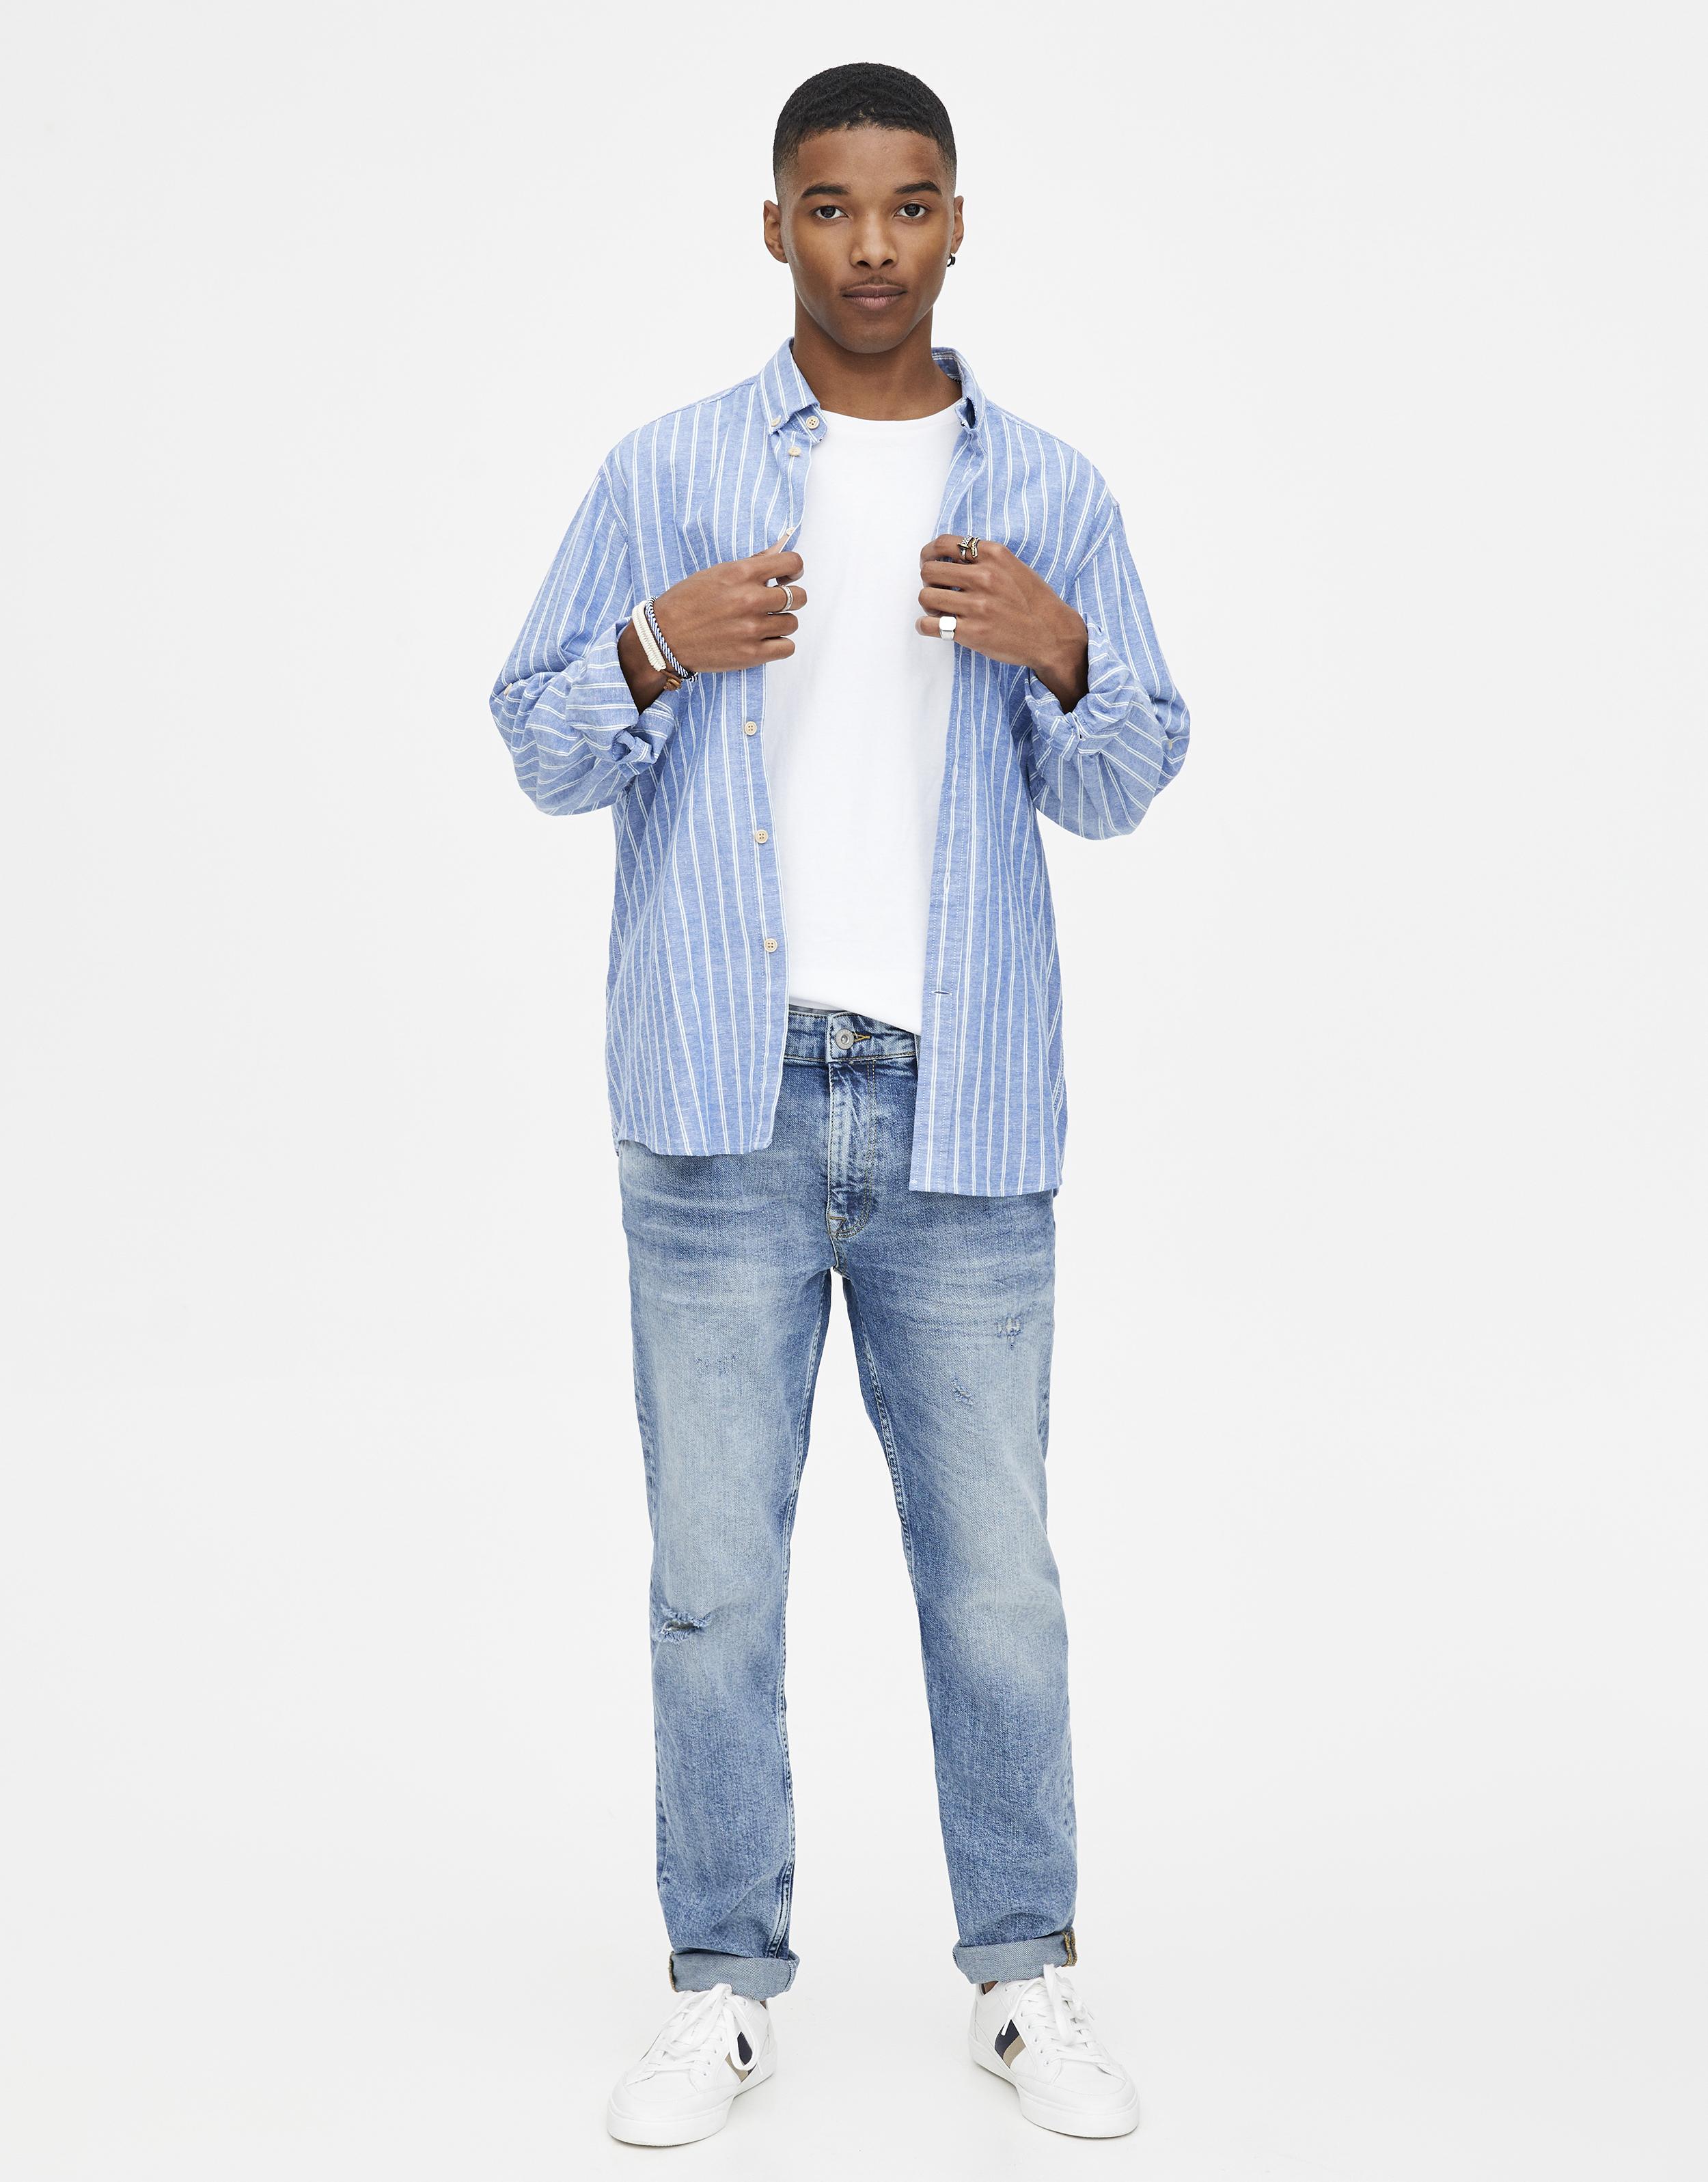 Men's Spring Summer Slim Fit amp;bear Jeans 2019Pull L35qj4AR